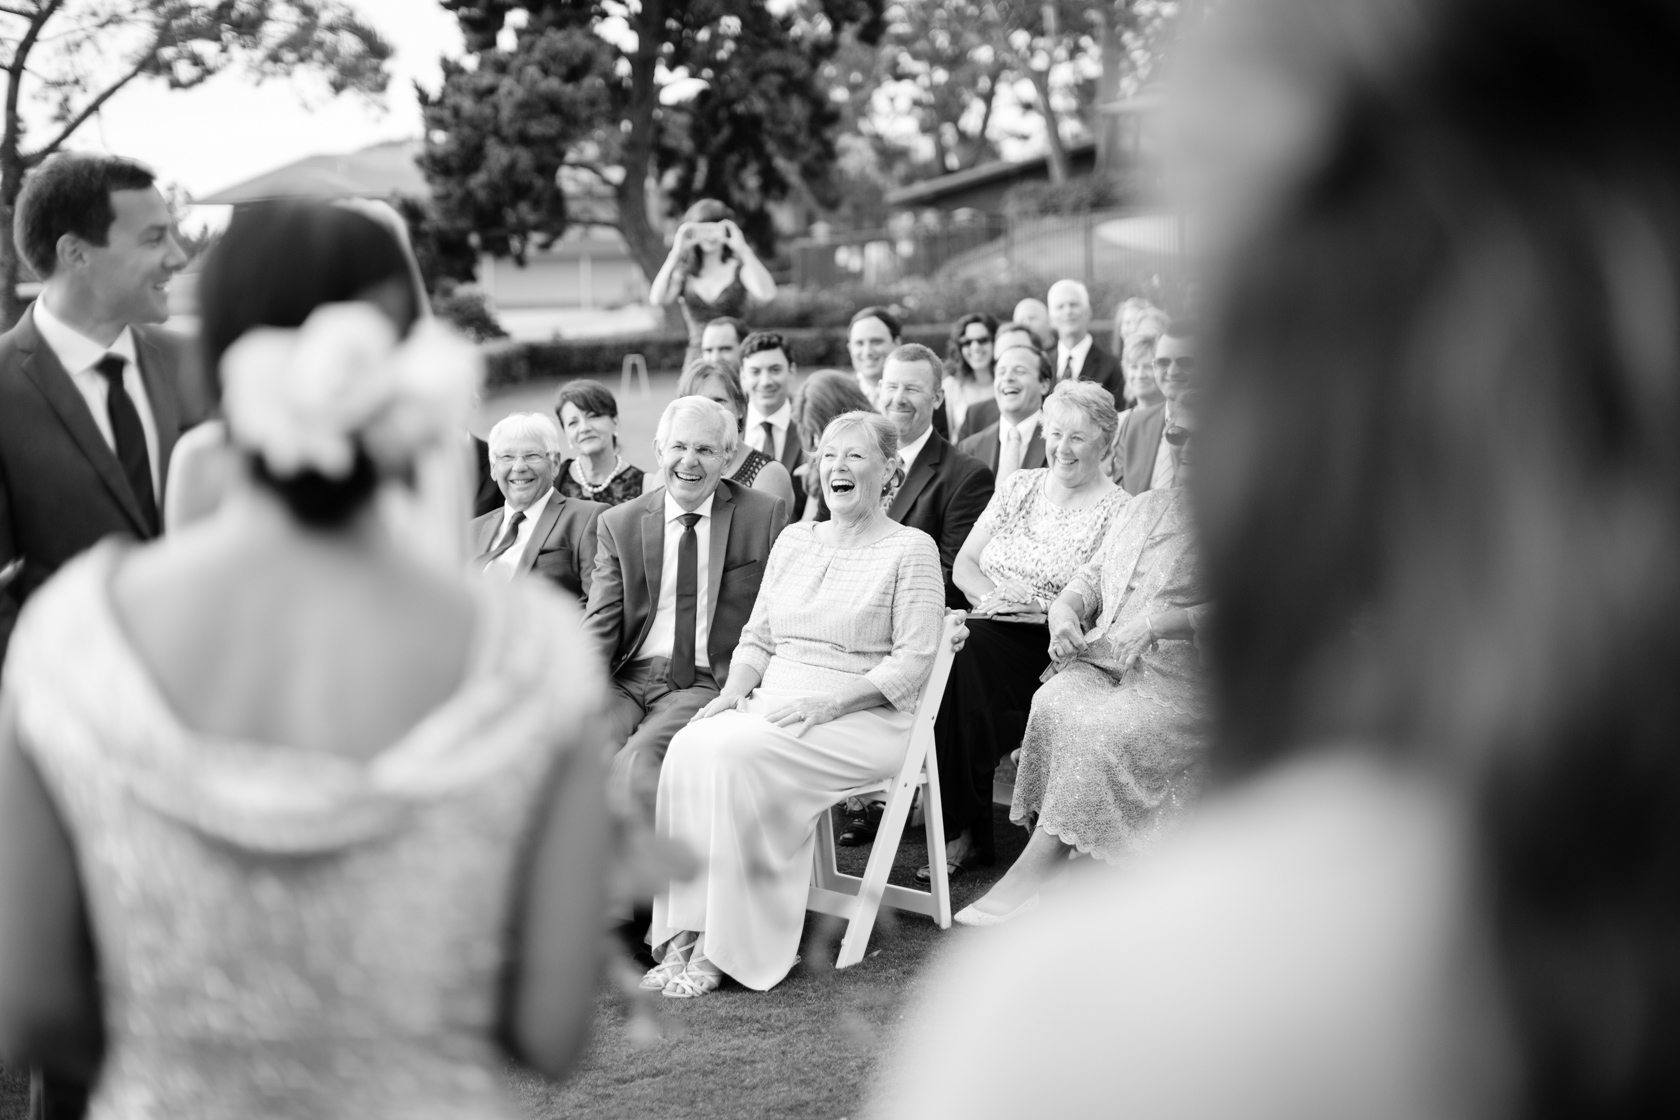 The_Lodge_at_Torrey_Pines_Wedding_058.jpg